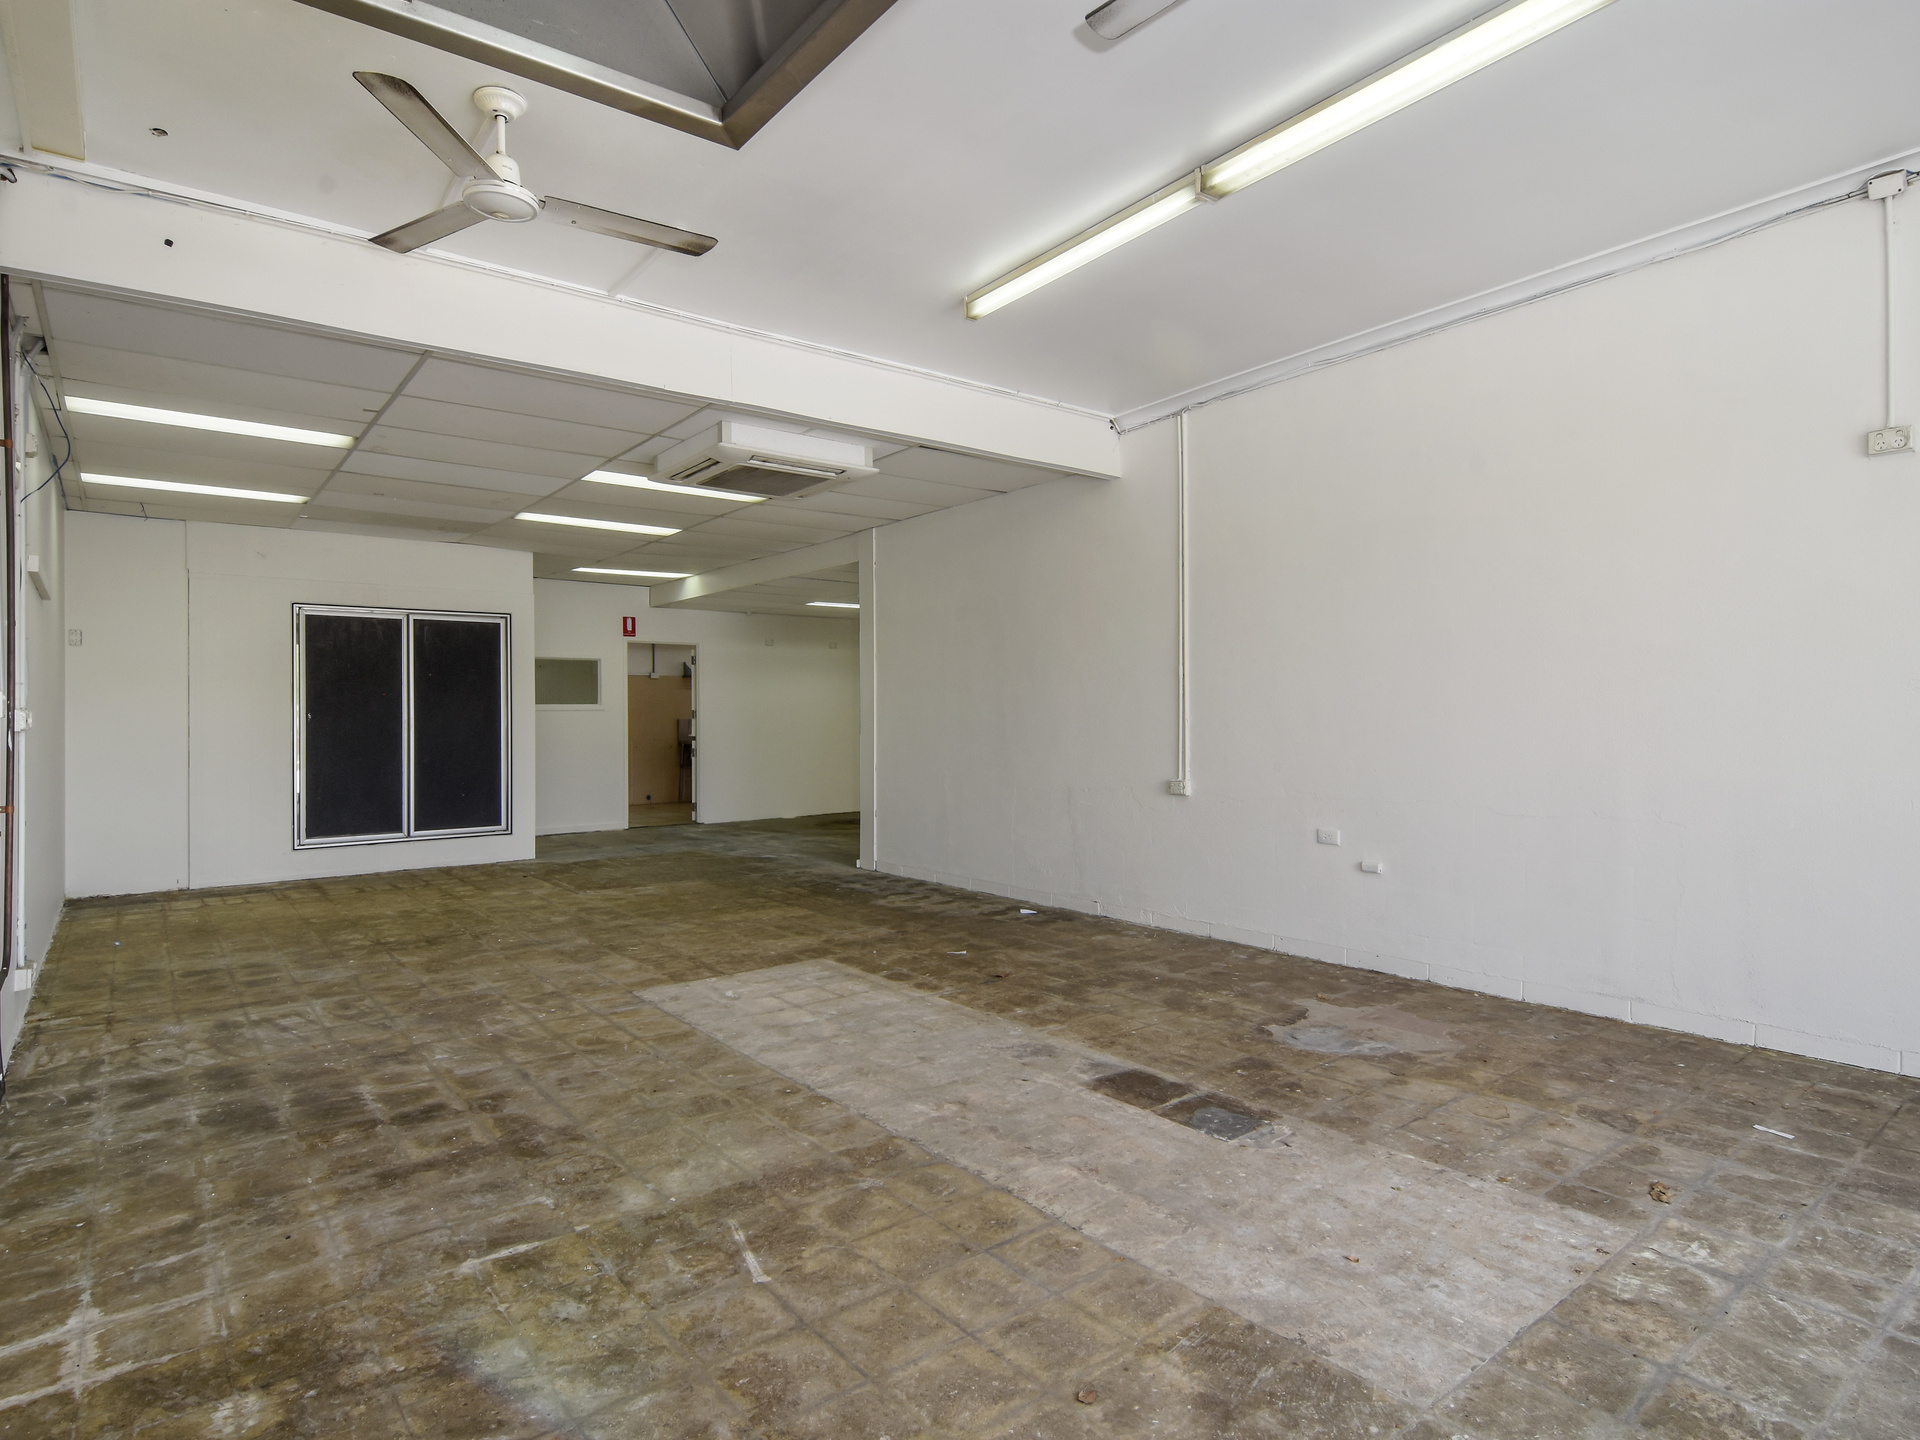 Real Estate | Gold Coast | Chevron Realty | 002 Open2view Id551921 6 1 Kalimna Street